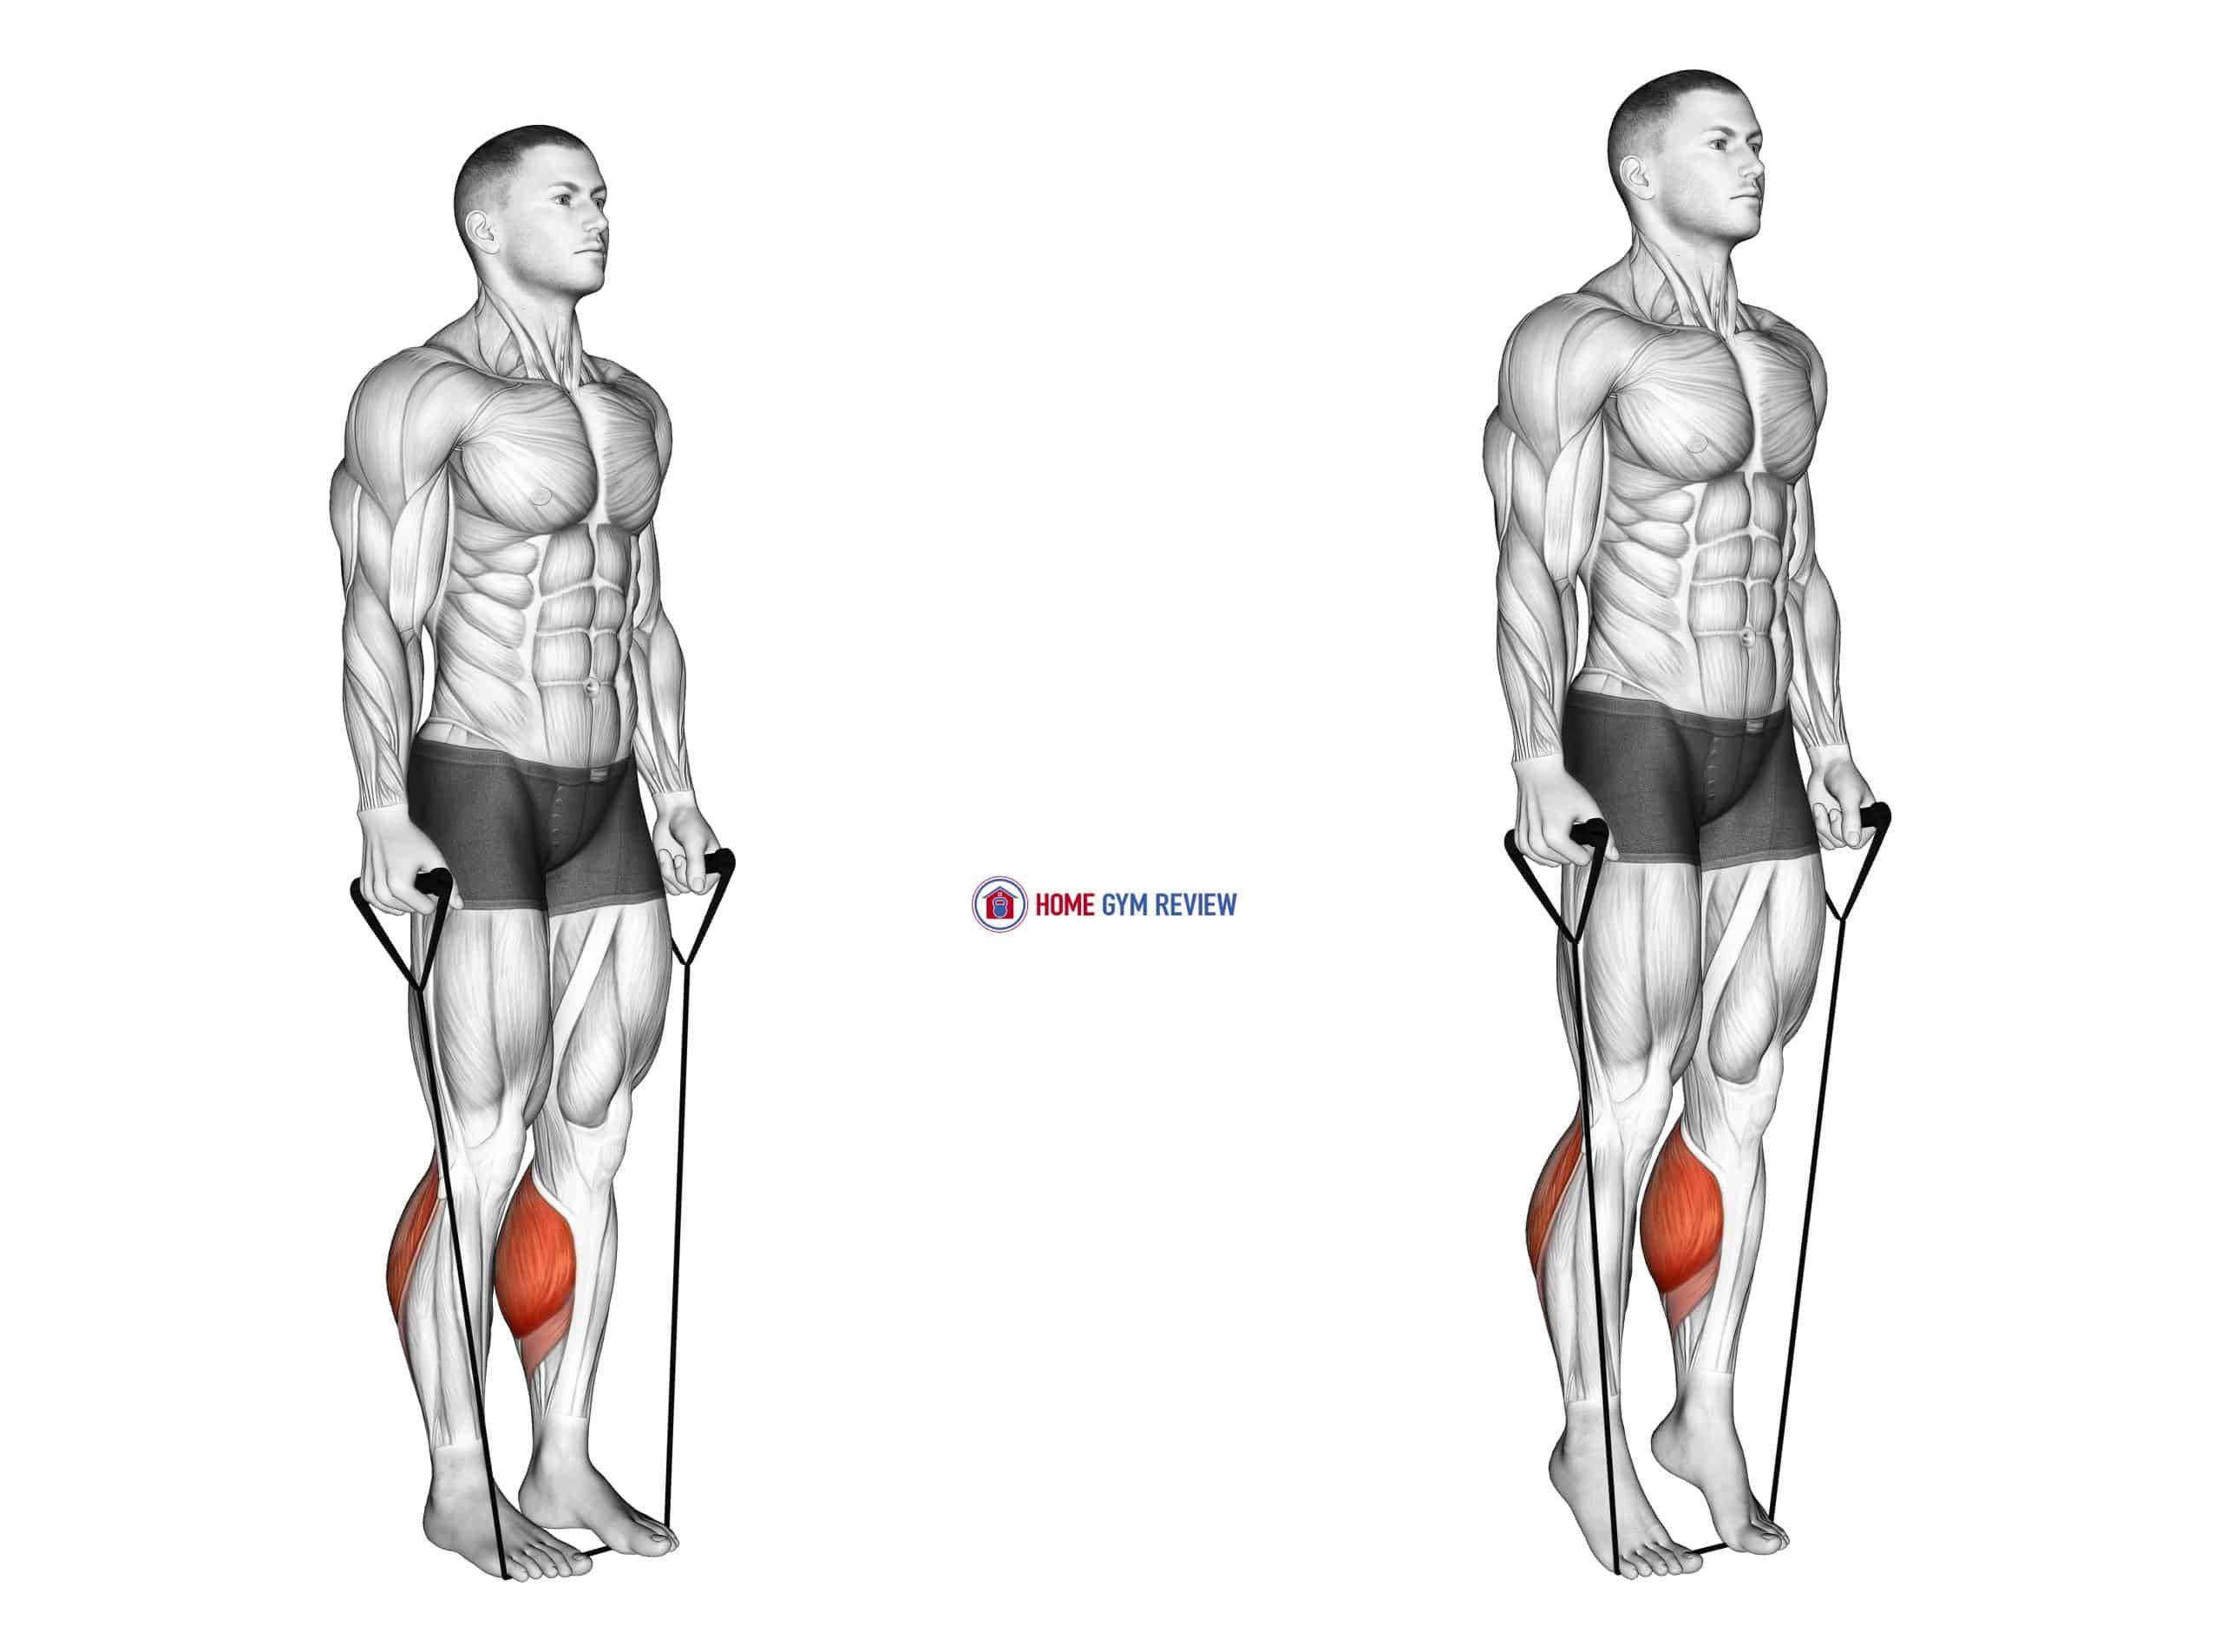 Band Two Legs Calf Raise - (Band under both legs) VERSION 2